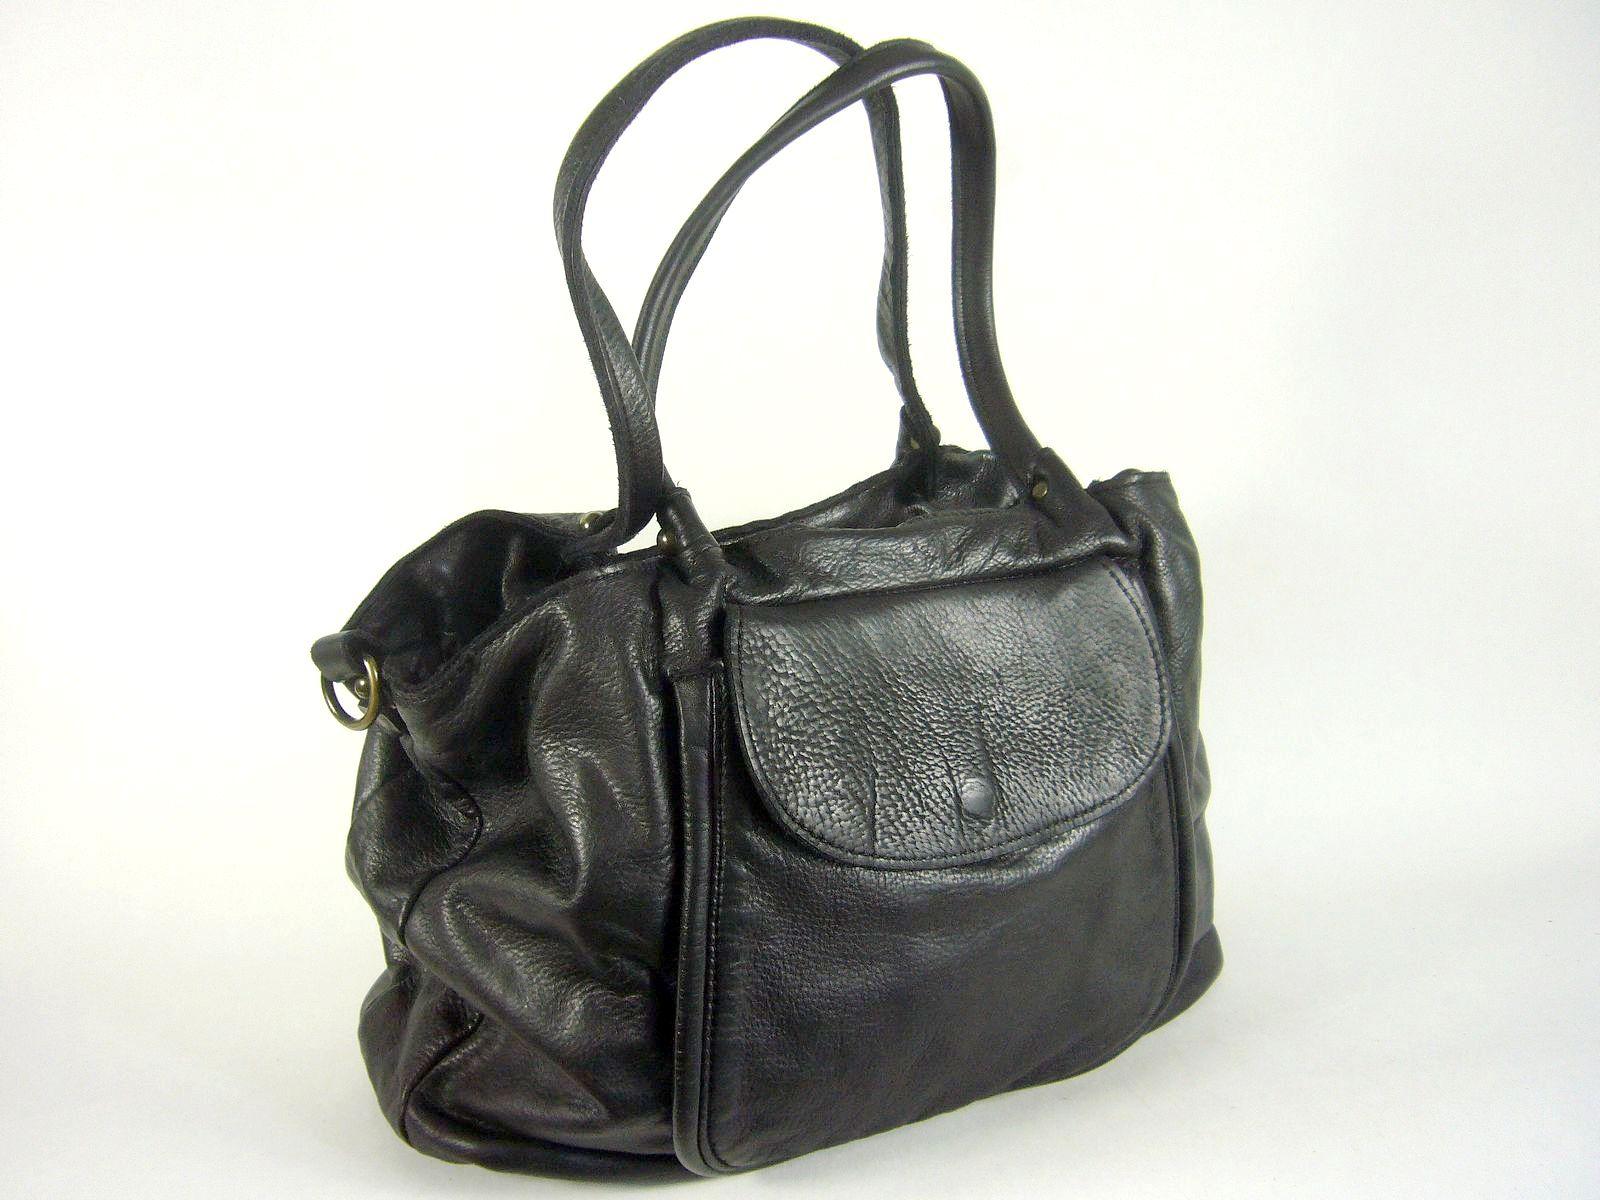 chaussures de sport a2232 b1101 Grand sac à main noir José